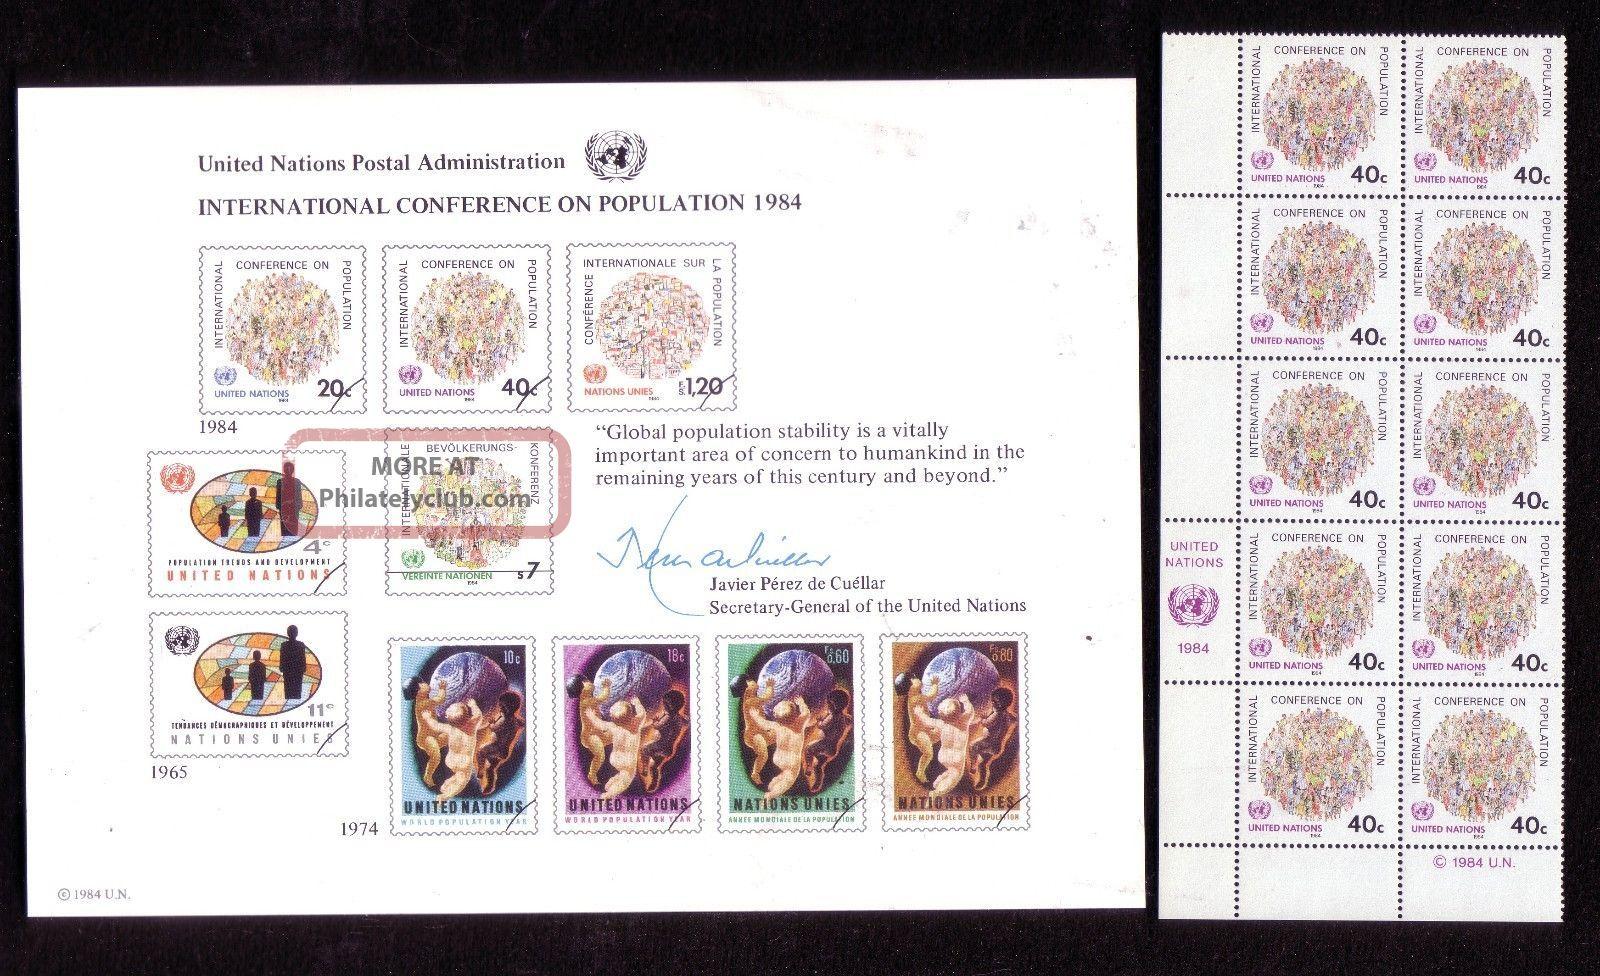 Sc25 418 Intl.  Conf.  On Population 1984 Un Souvenir Card Block 10 Forty Cents Worldwide photo